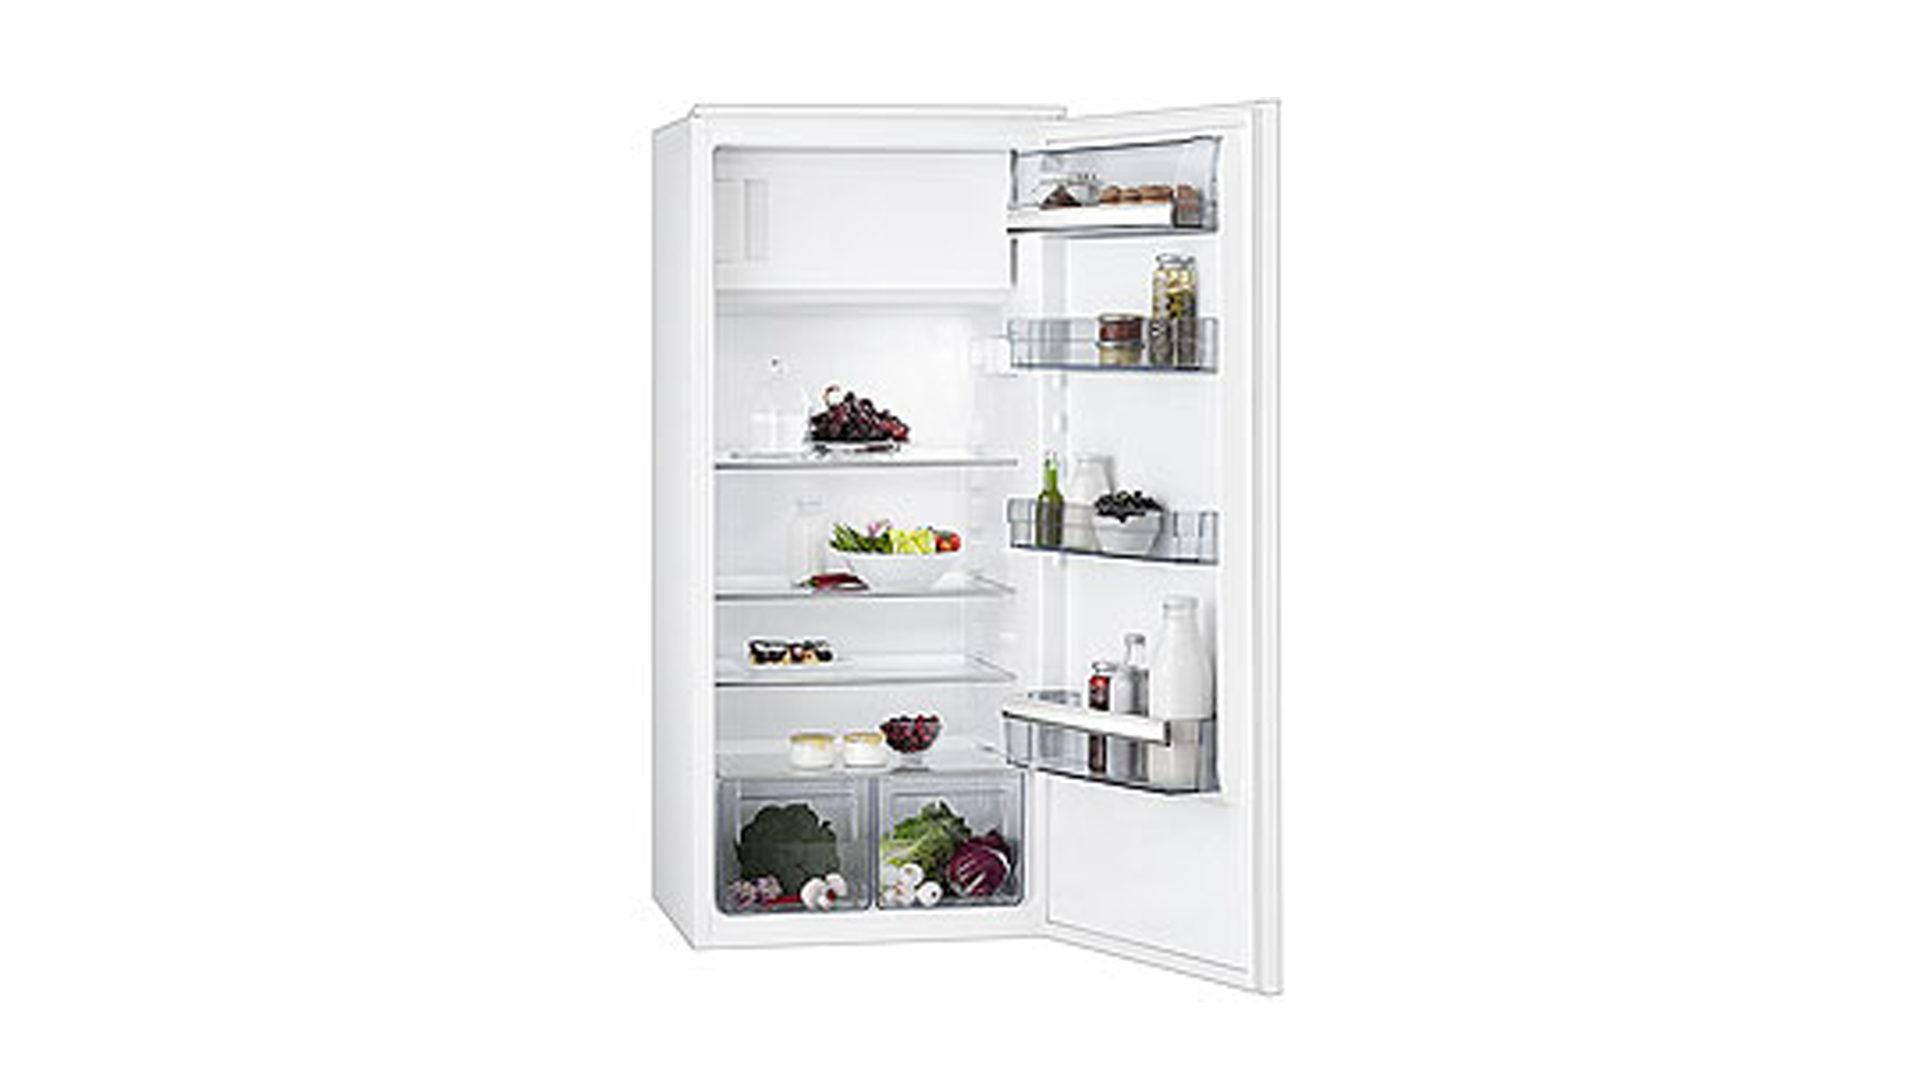 Kühlschrank Gebraucht : Kühlschrank gebraucht coesfeld inspirational facades seamless